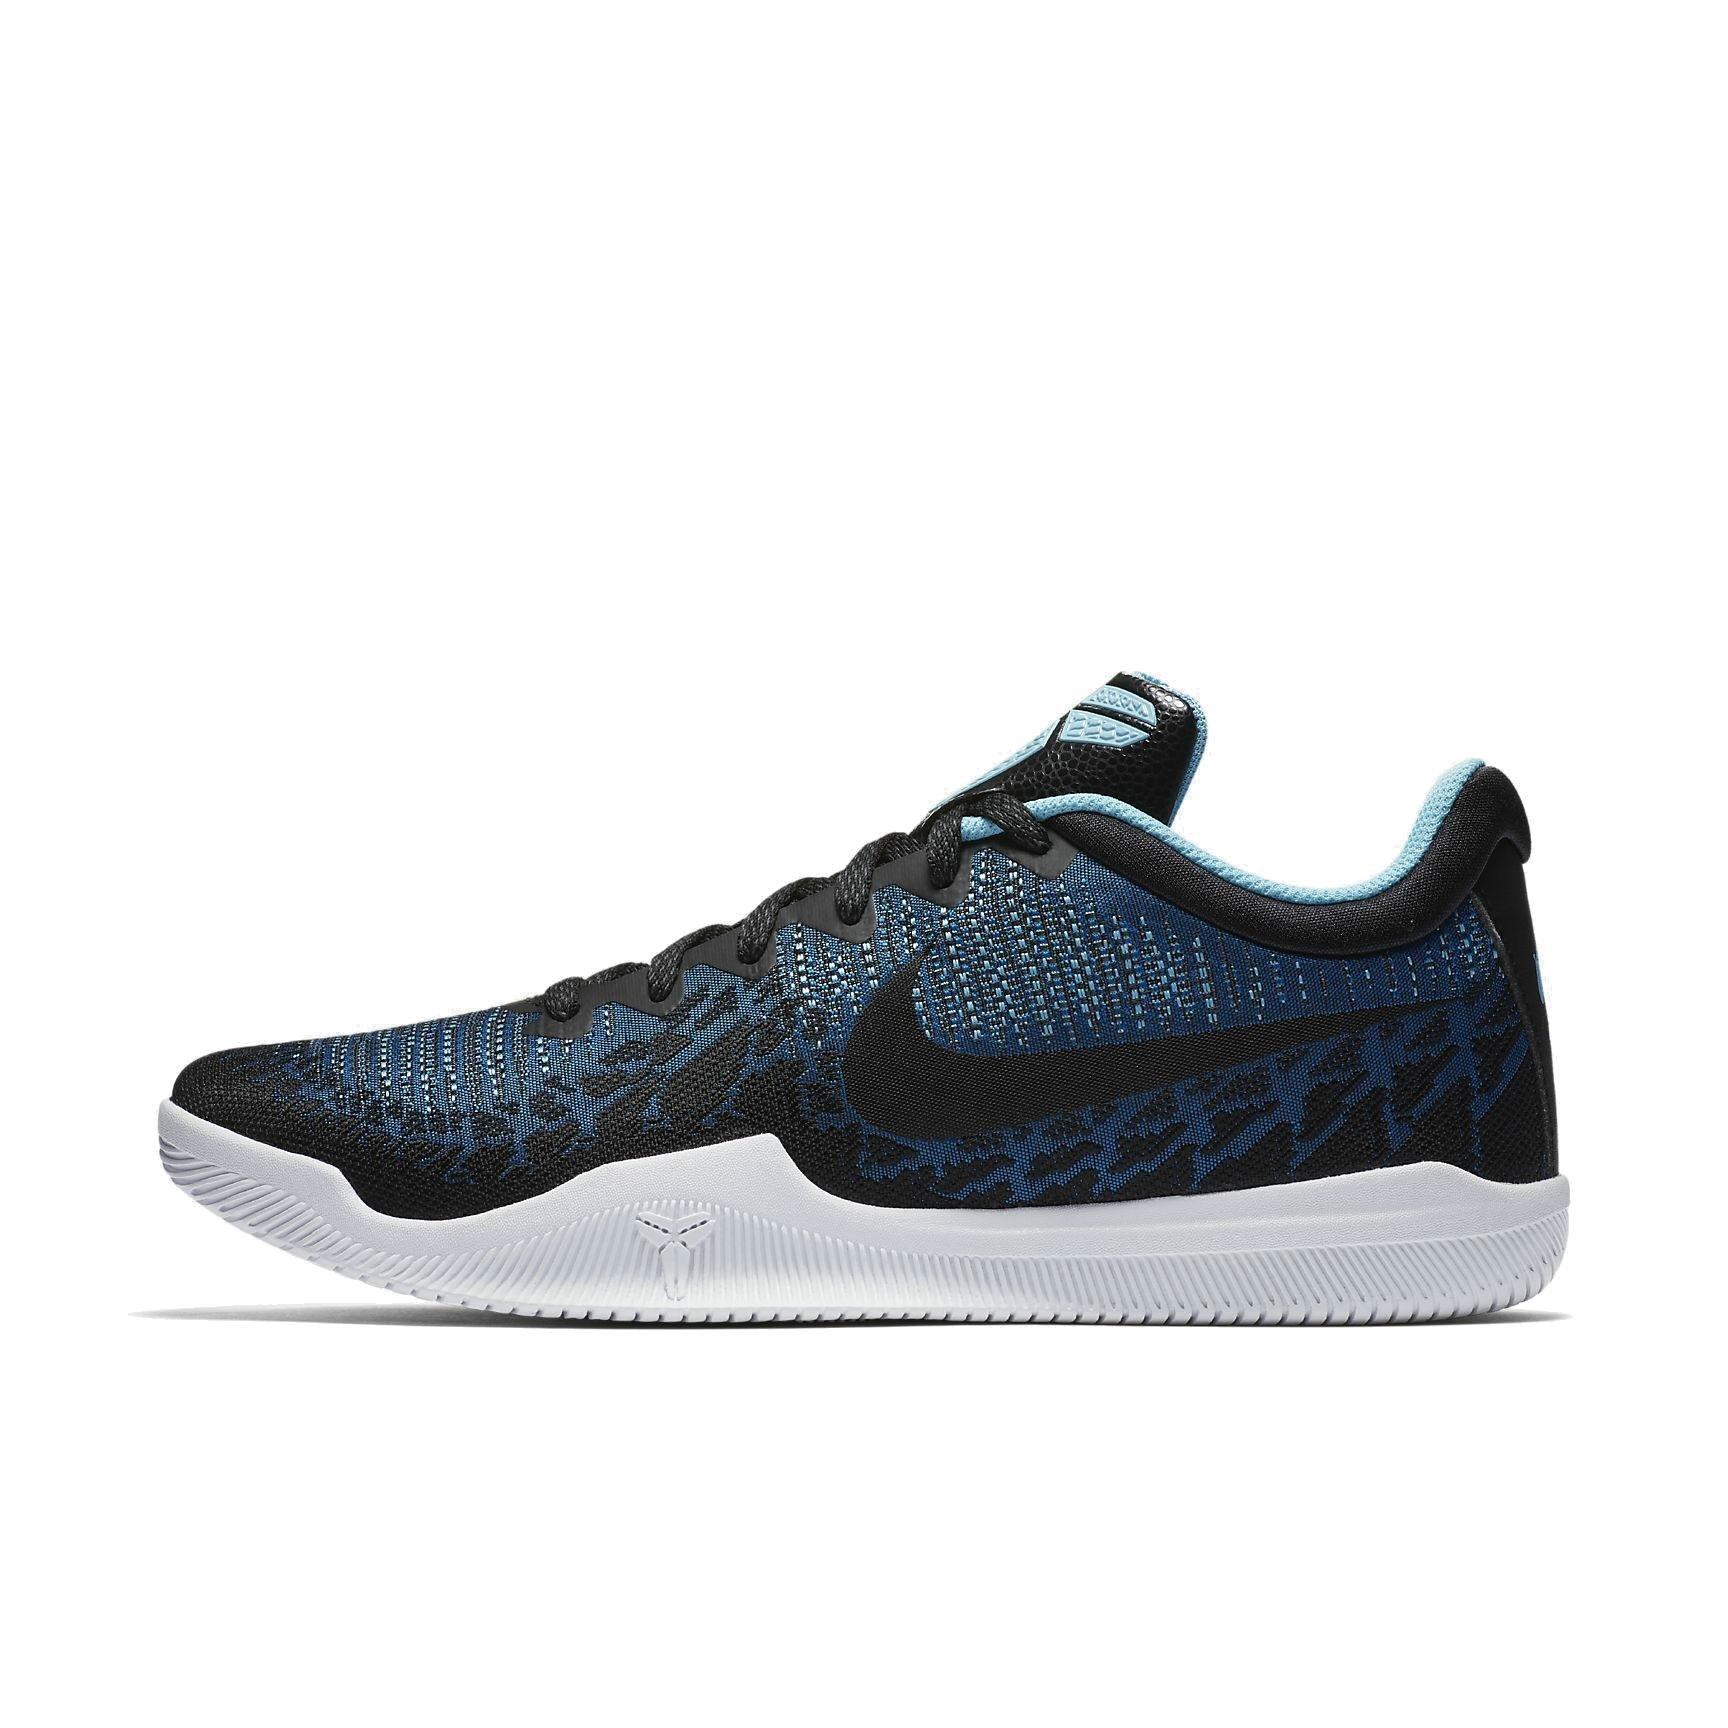 92c1a2d4995 Galleon - NIKE Men s Mamba Rage Basketball Shoes Blue Nebula Black Blue  Gale White Size 12 M US